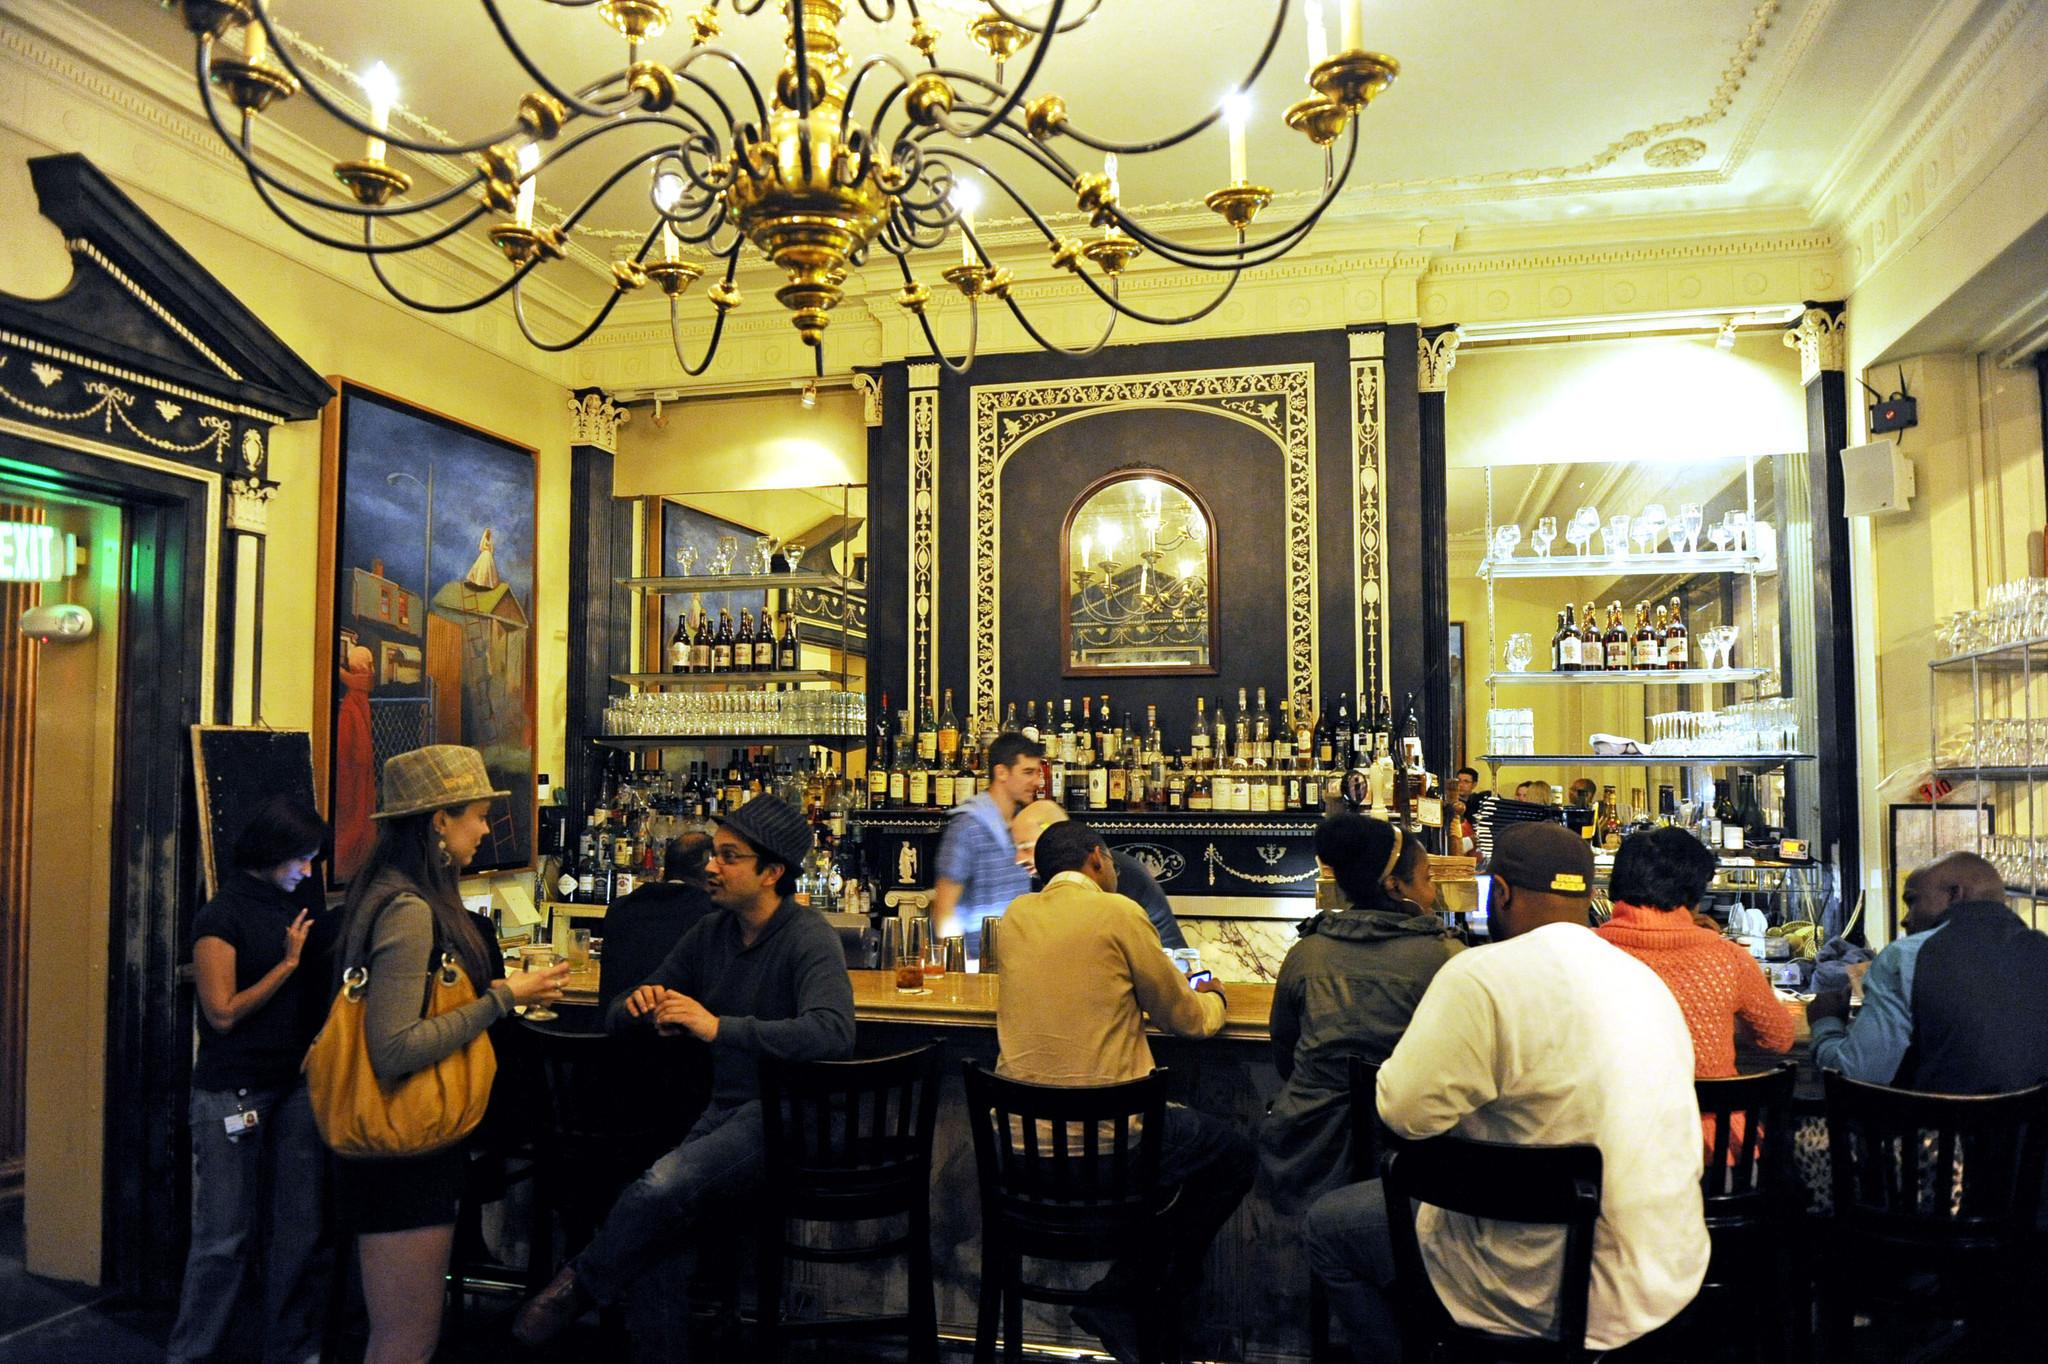 15 beautiful restaurant spaces in Baltimore - Baltimore Sun